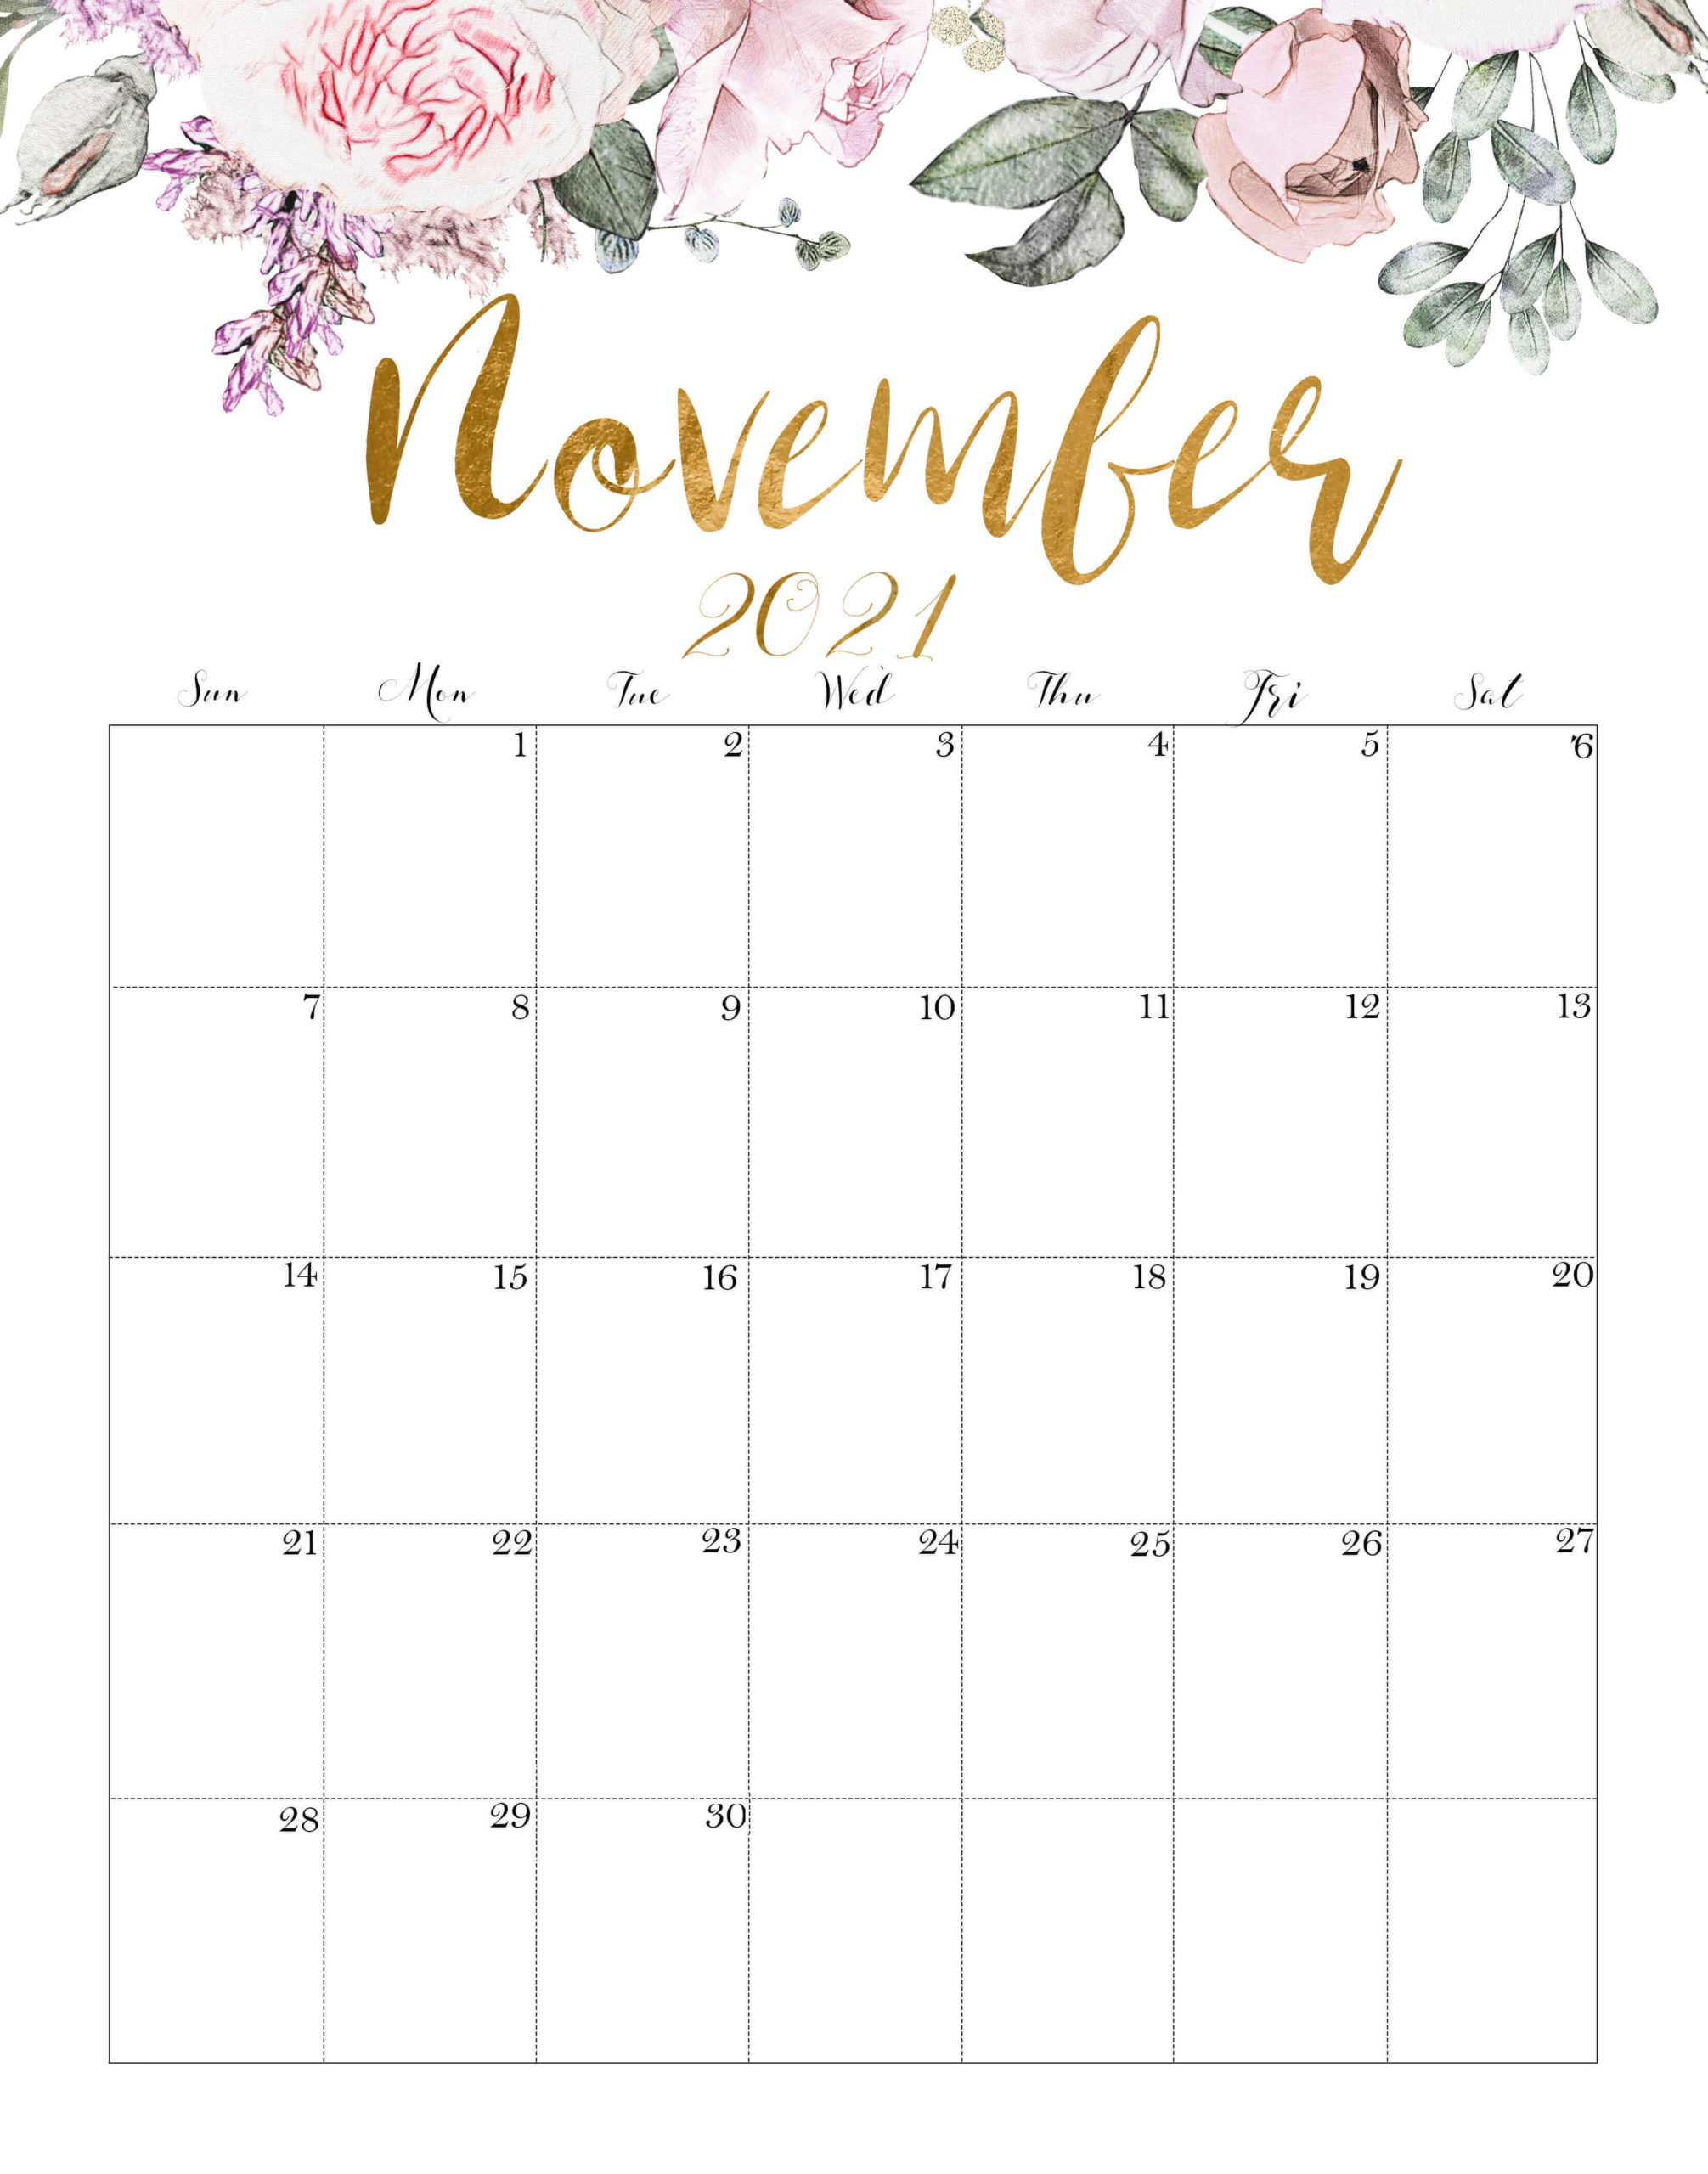 Floral November 2021 Wall Calendar